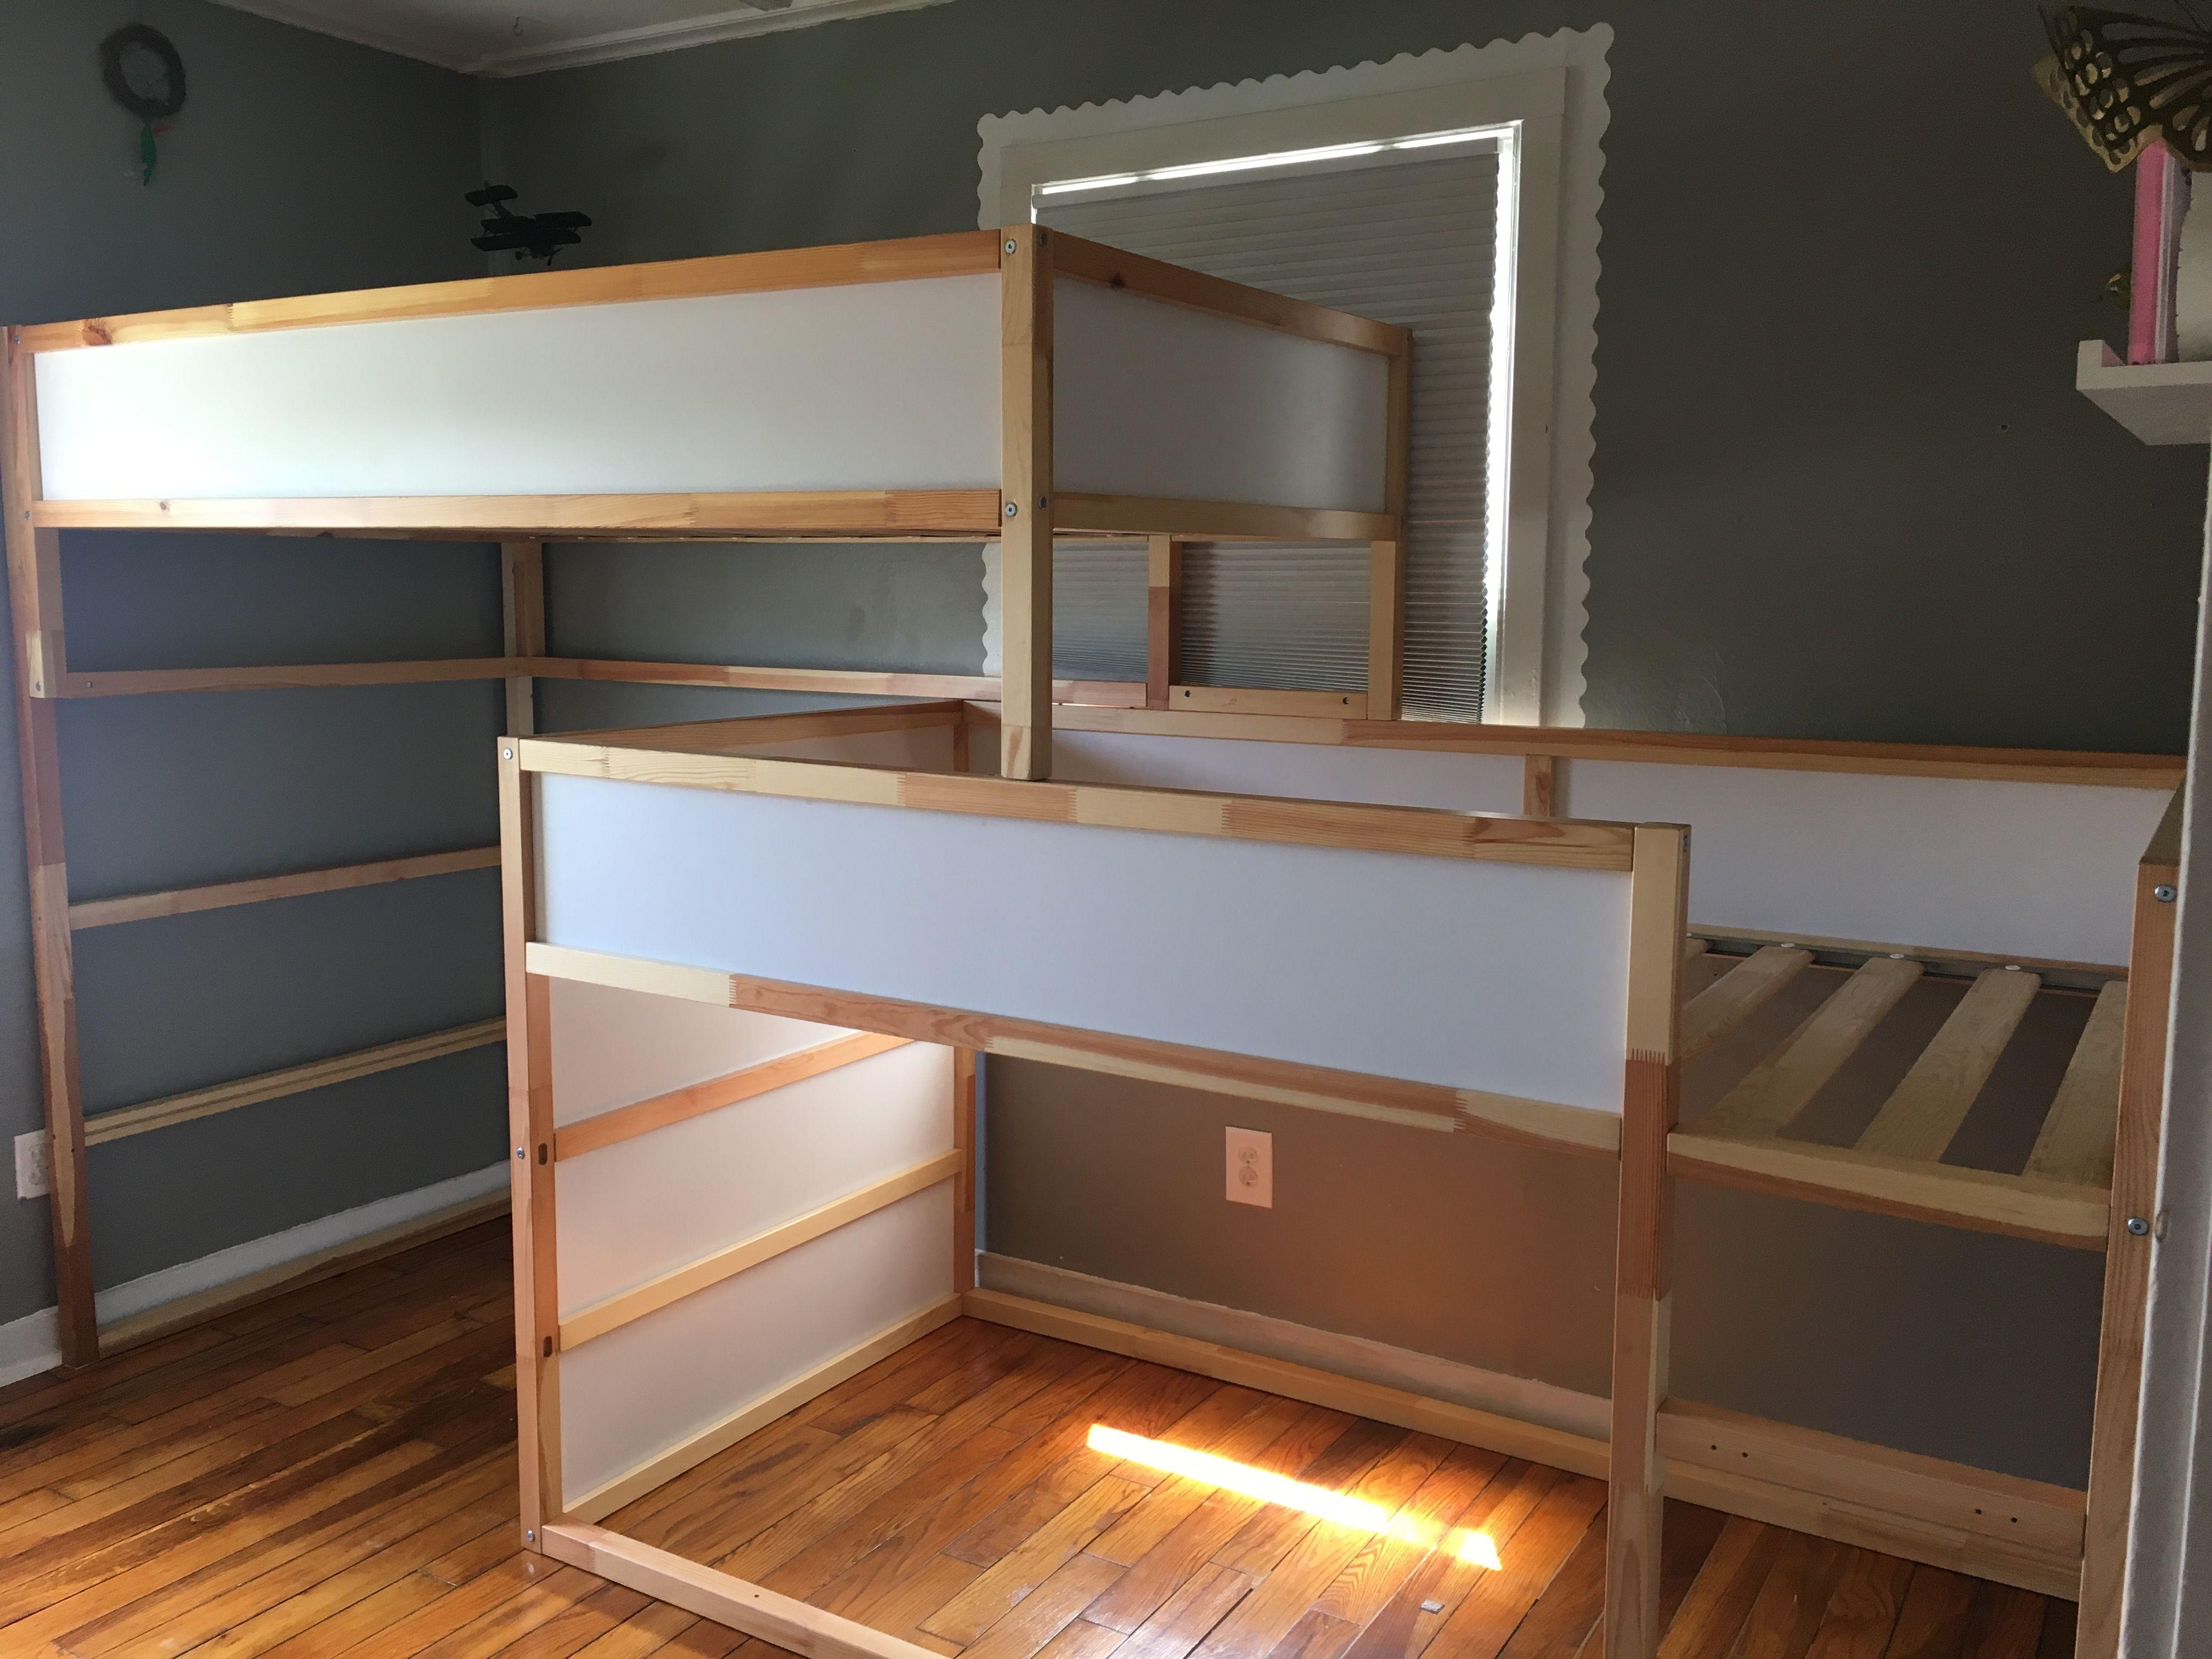 Ikea Kura Triple Bunk Bed Hack I Can Make That In